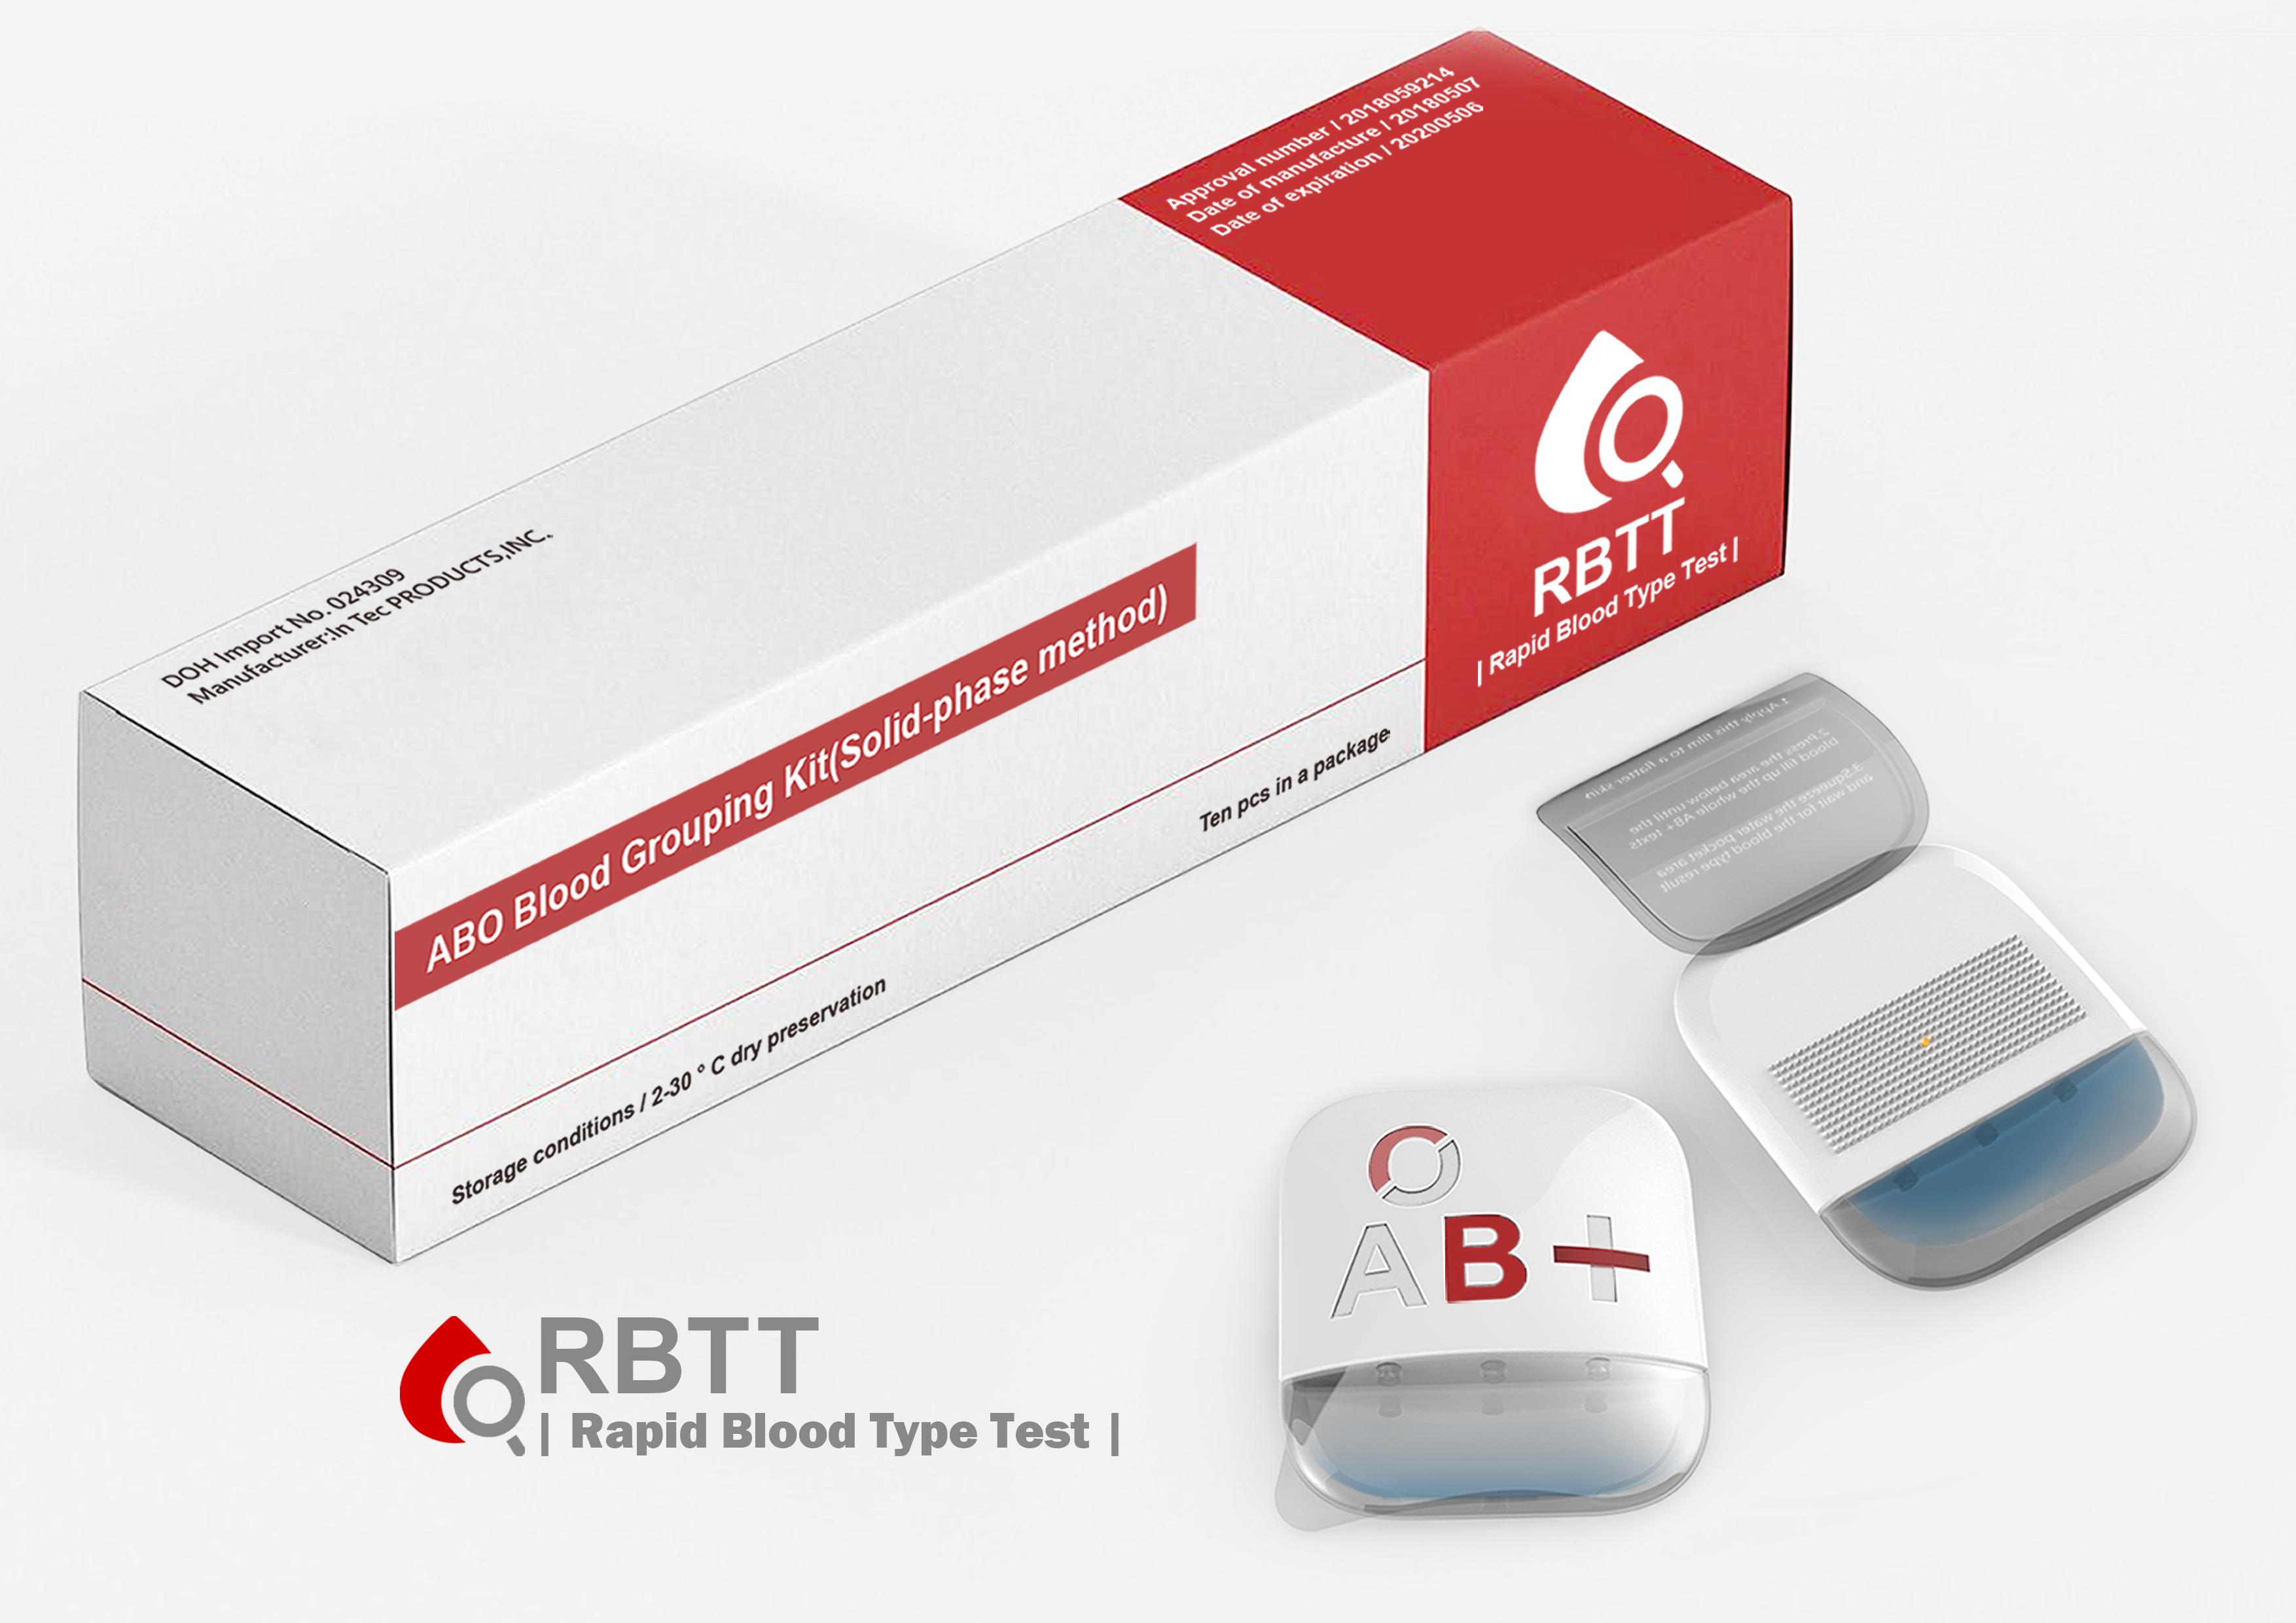 RBTT(Rapid Blood Type Test )